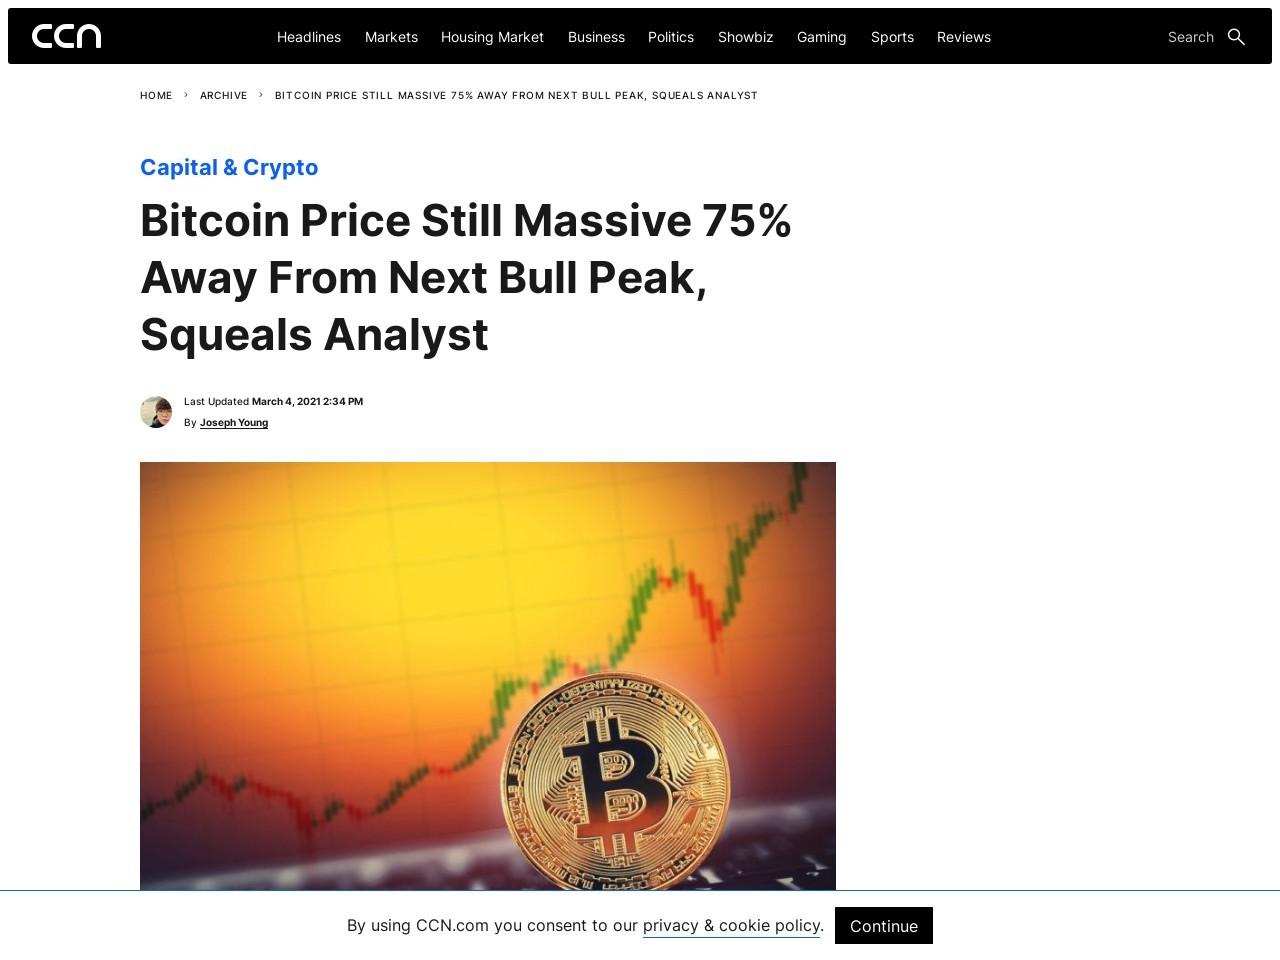 Bitcoin Price Still Massive 75% Away From Next Bull Peak, Squeals Analyst